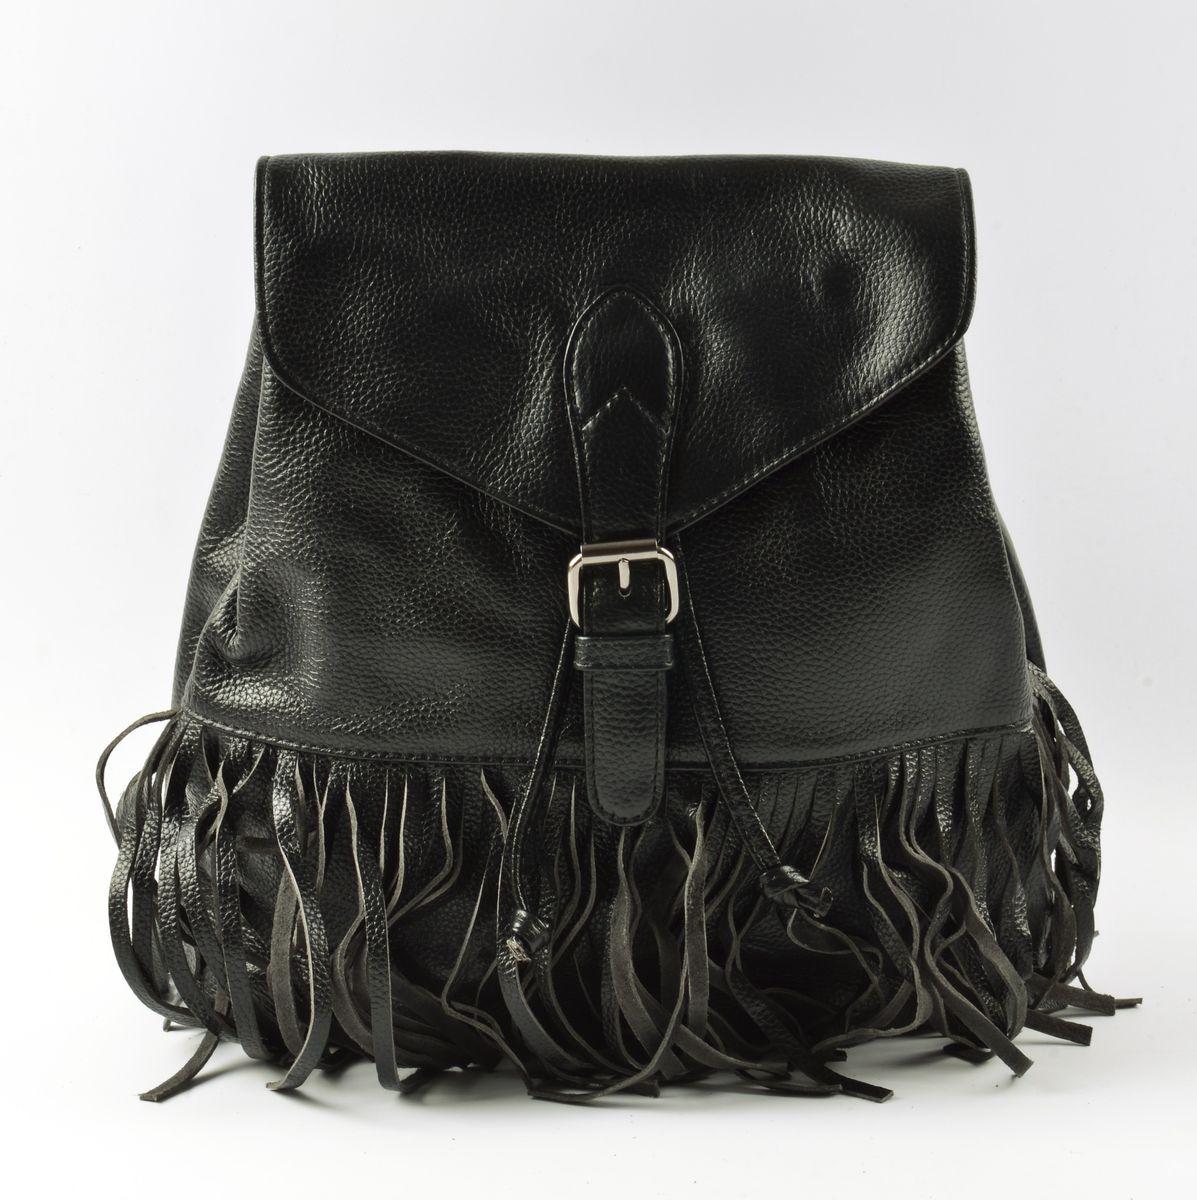 Рюкзак женский Topo Fortunato, TF-B 903-019, черный все цены